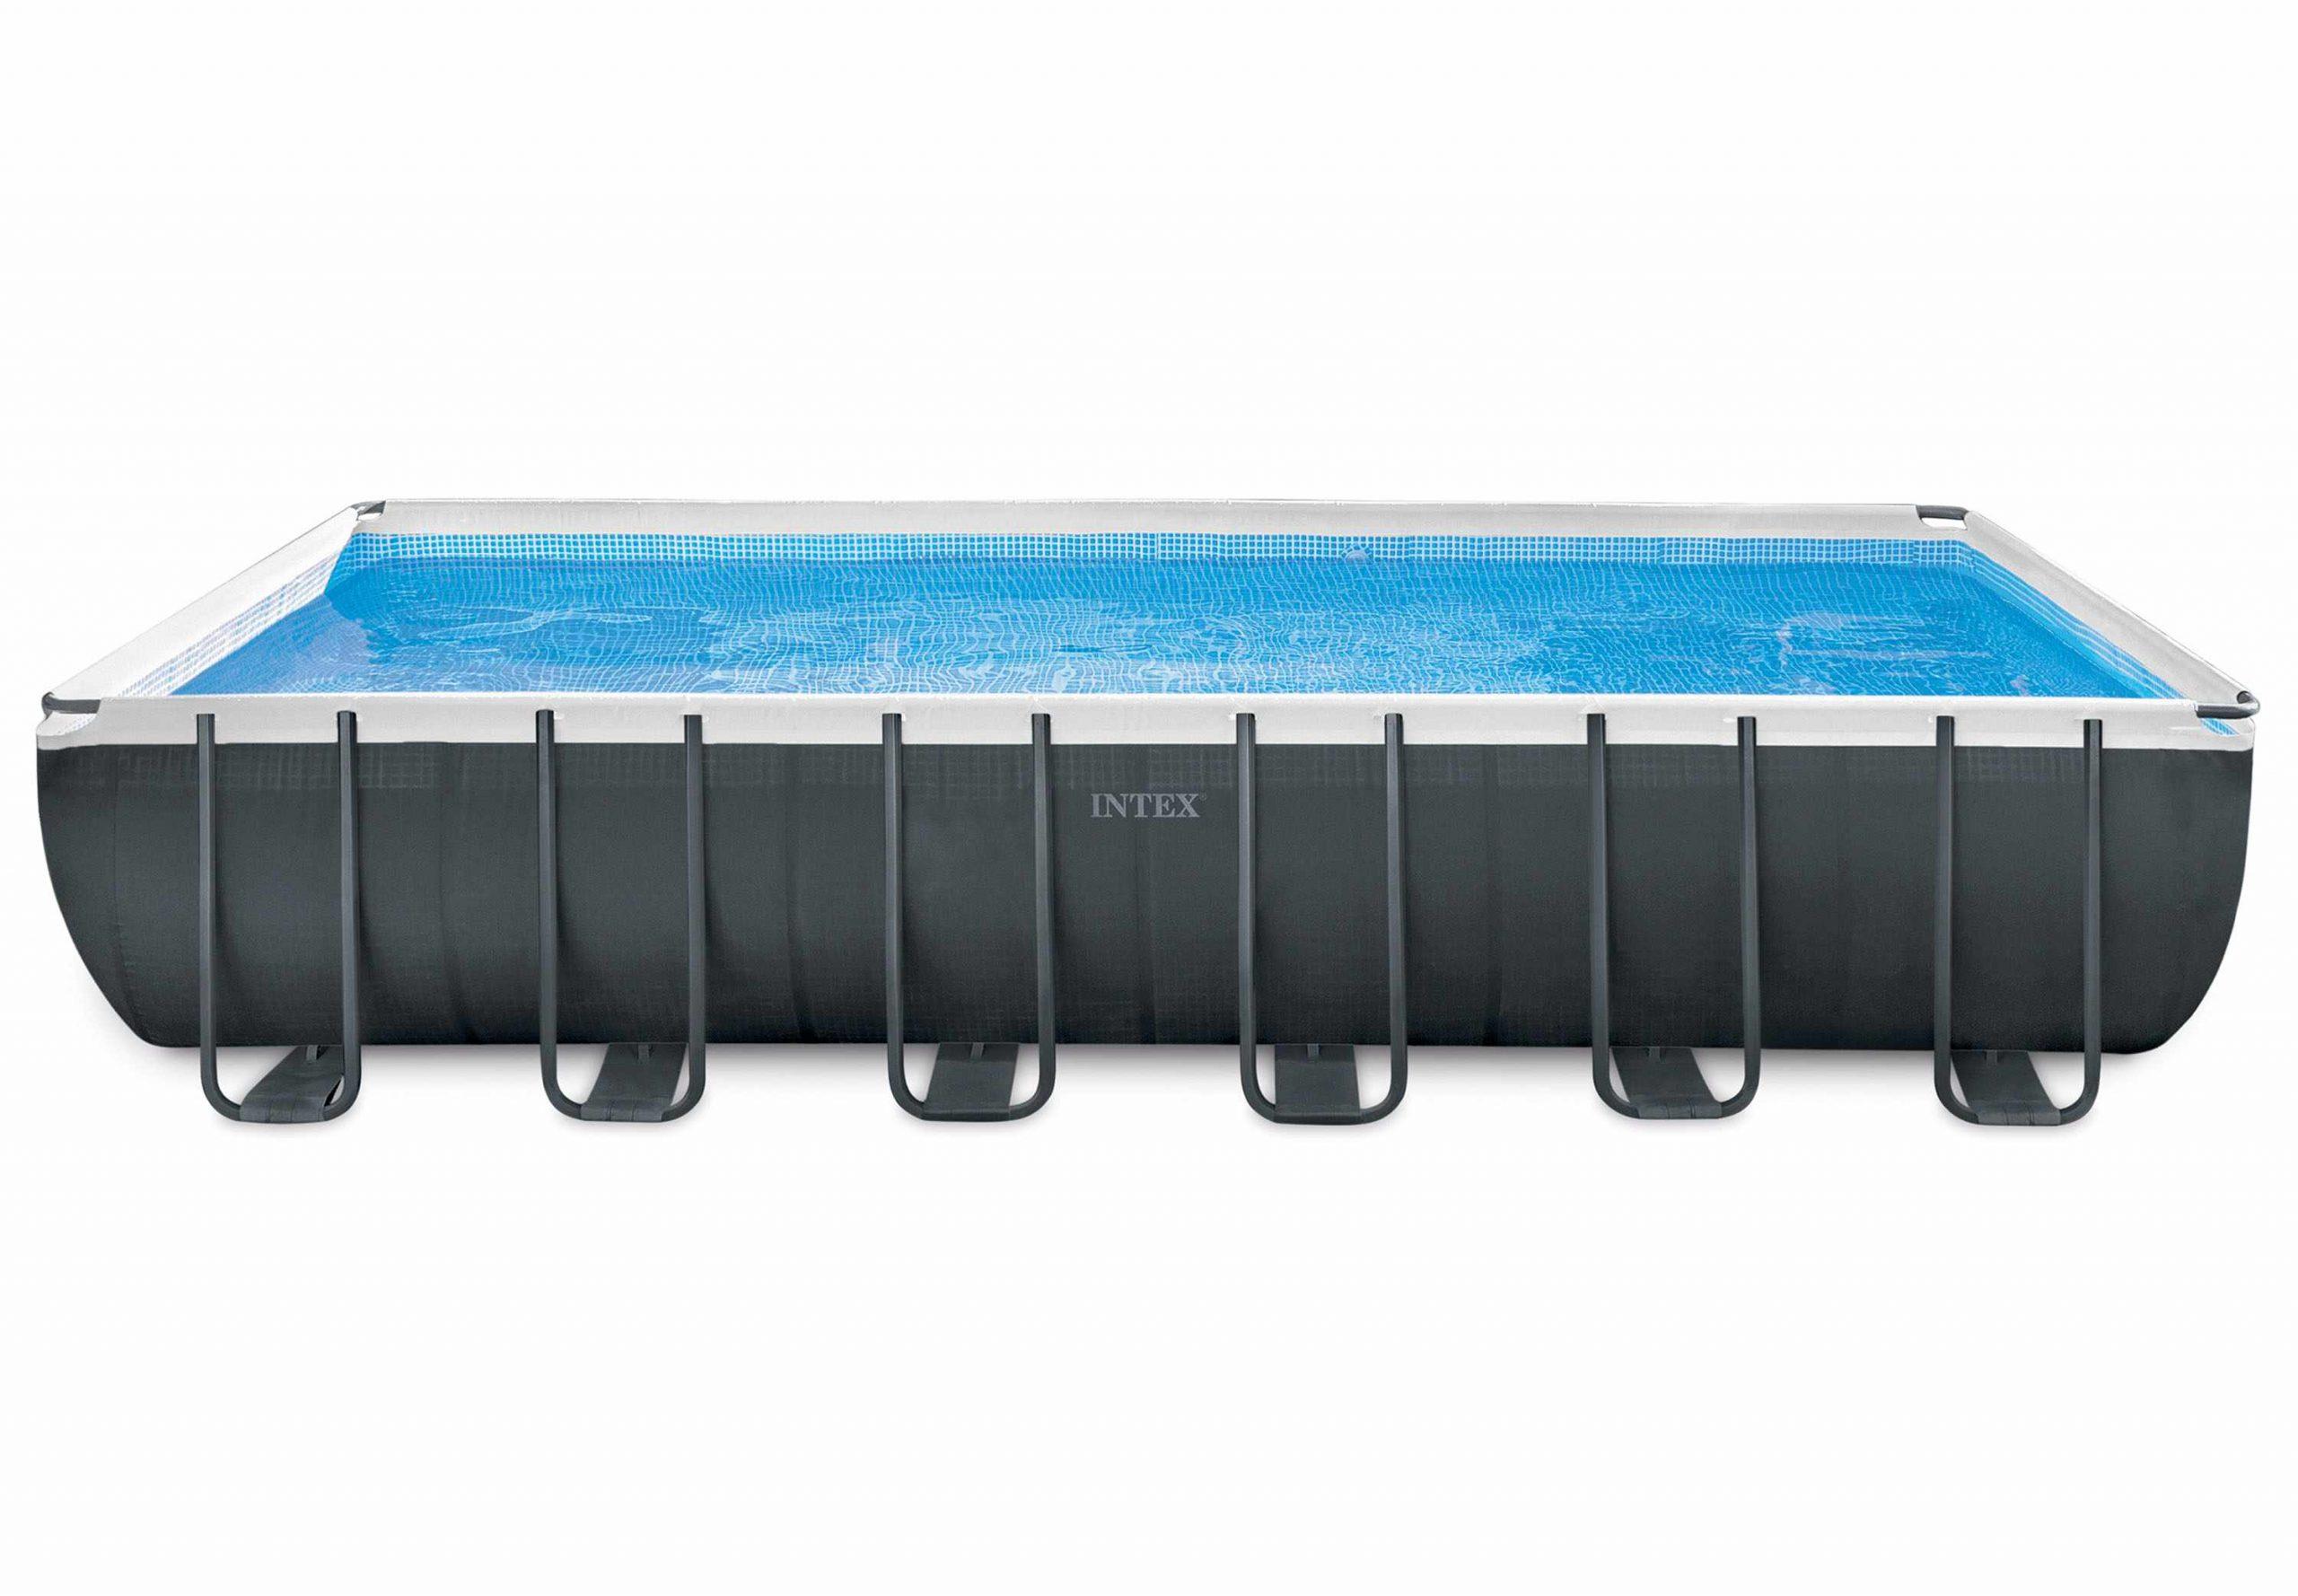 Intex 26368 Ex 26362 Ultra Xtr Premium Frame Above Ground Rectangular Pool  732X366X132Cm destiné Liner Piscine Intex